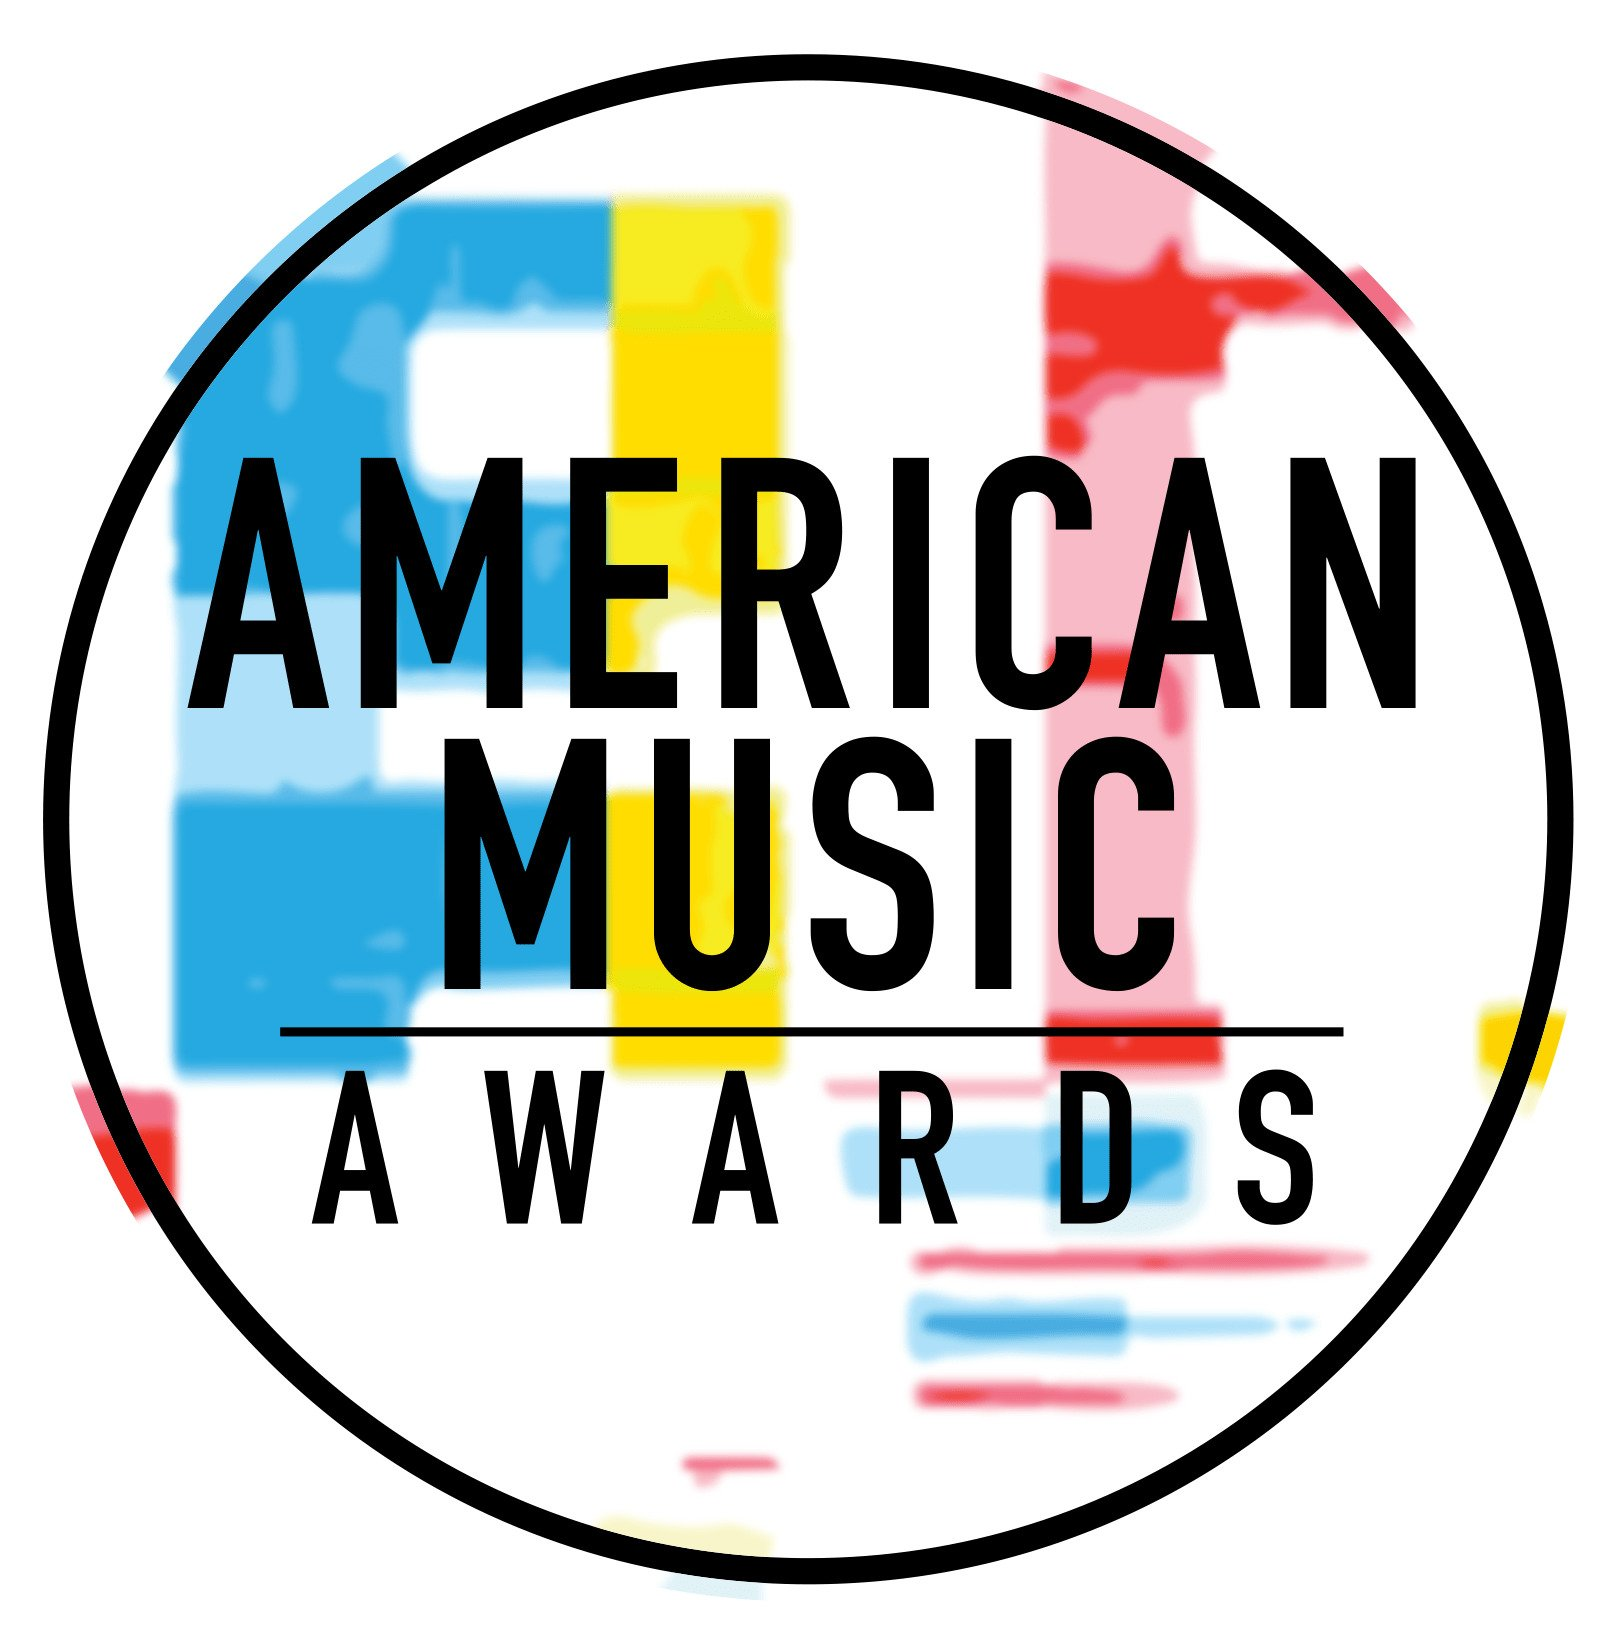 File:American-Music-Awards-logo.jpg